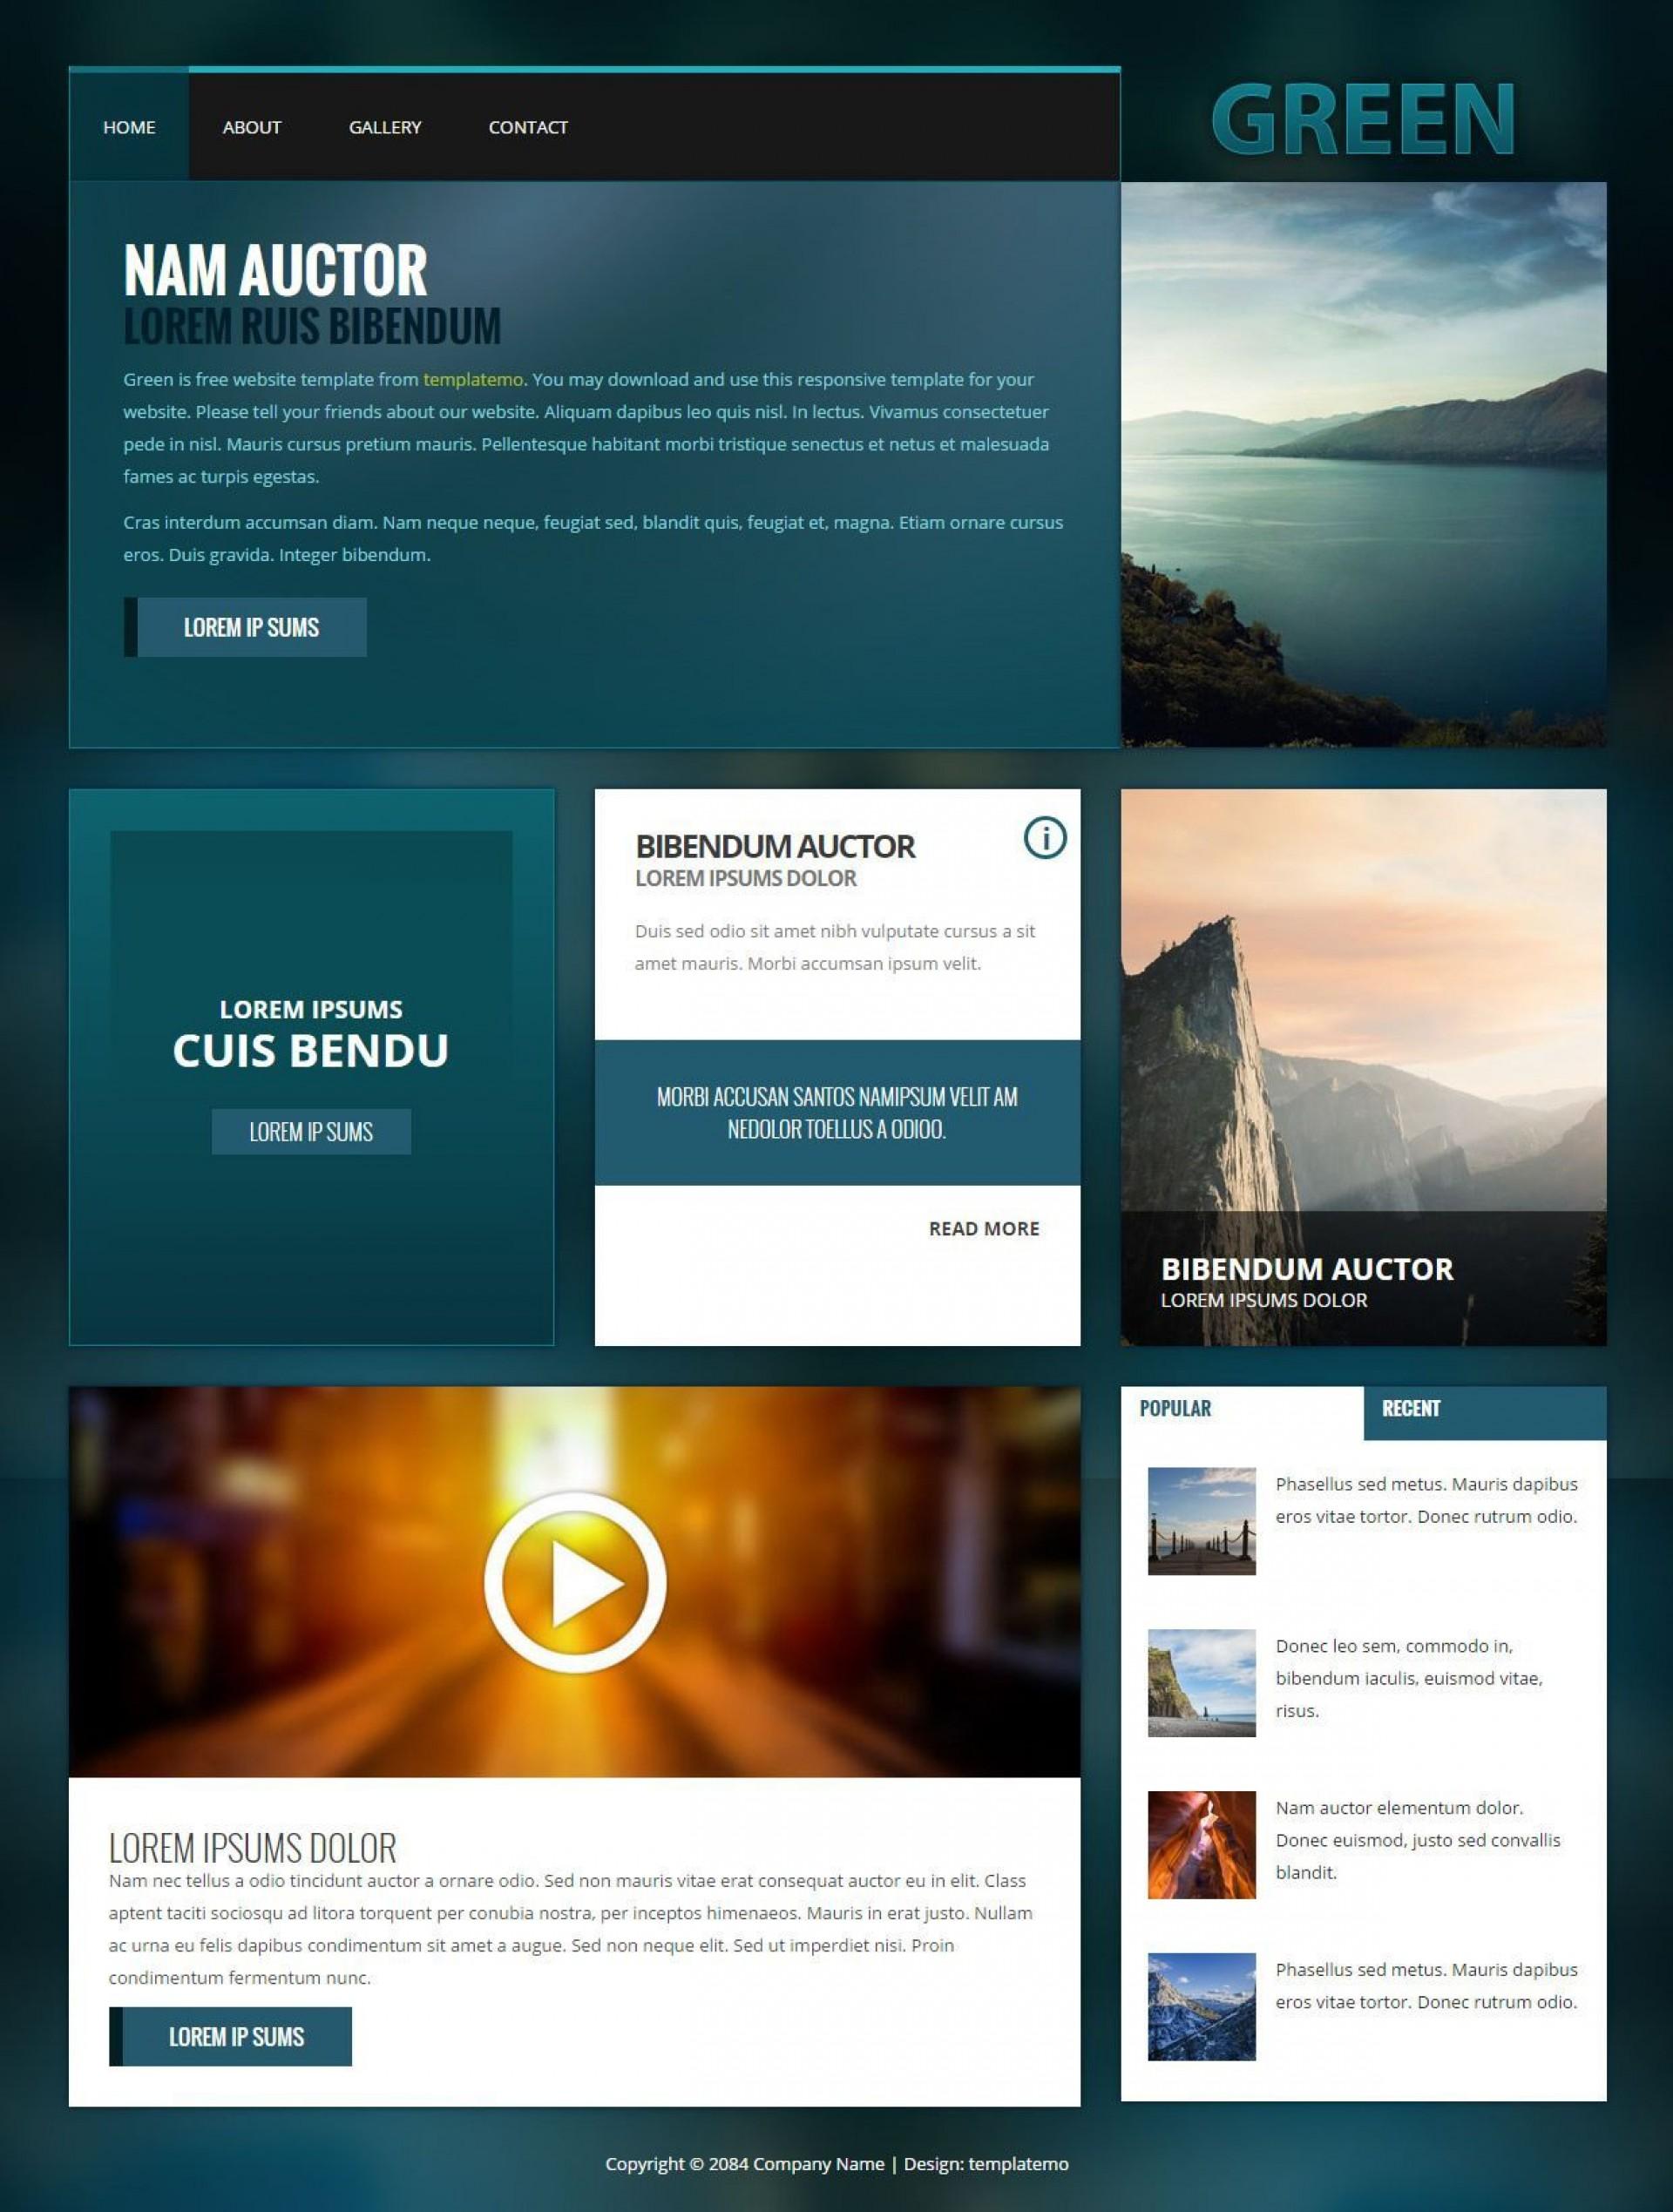 001 Striking Web Page Design Template Cs Image  Css1920